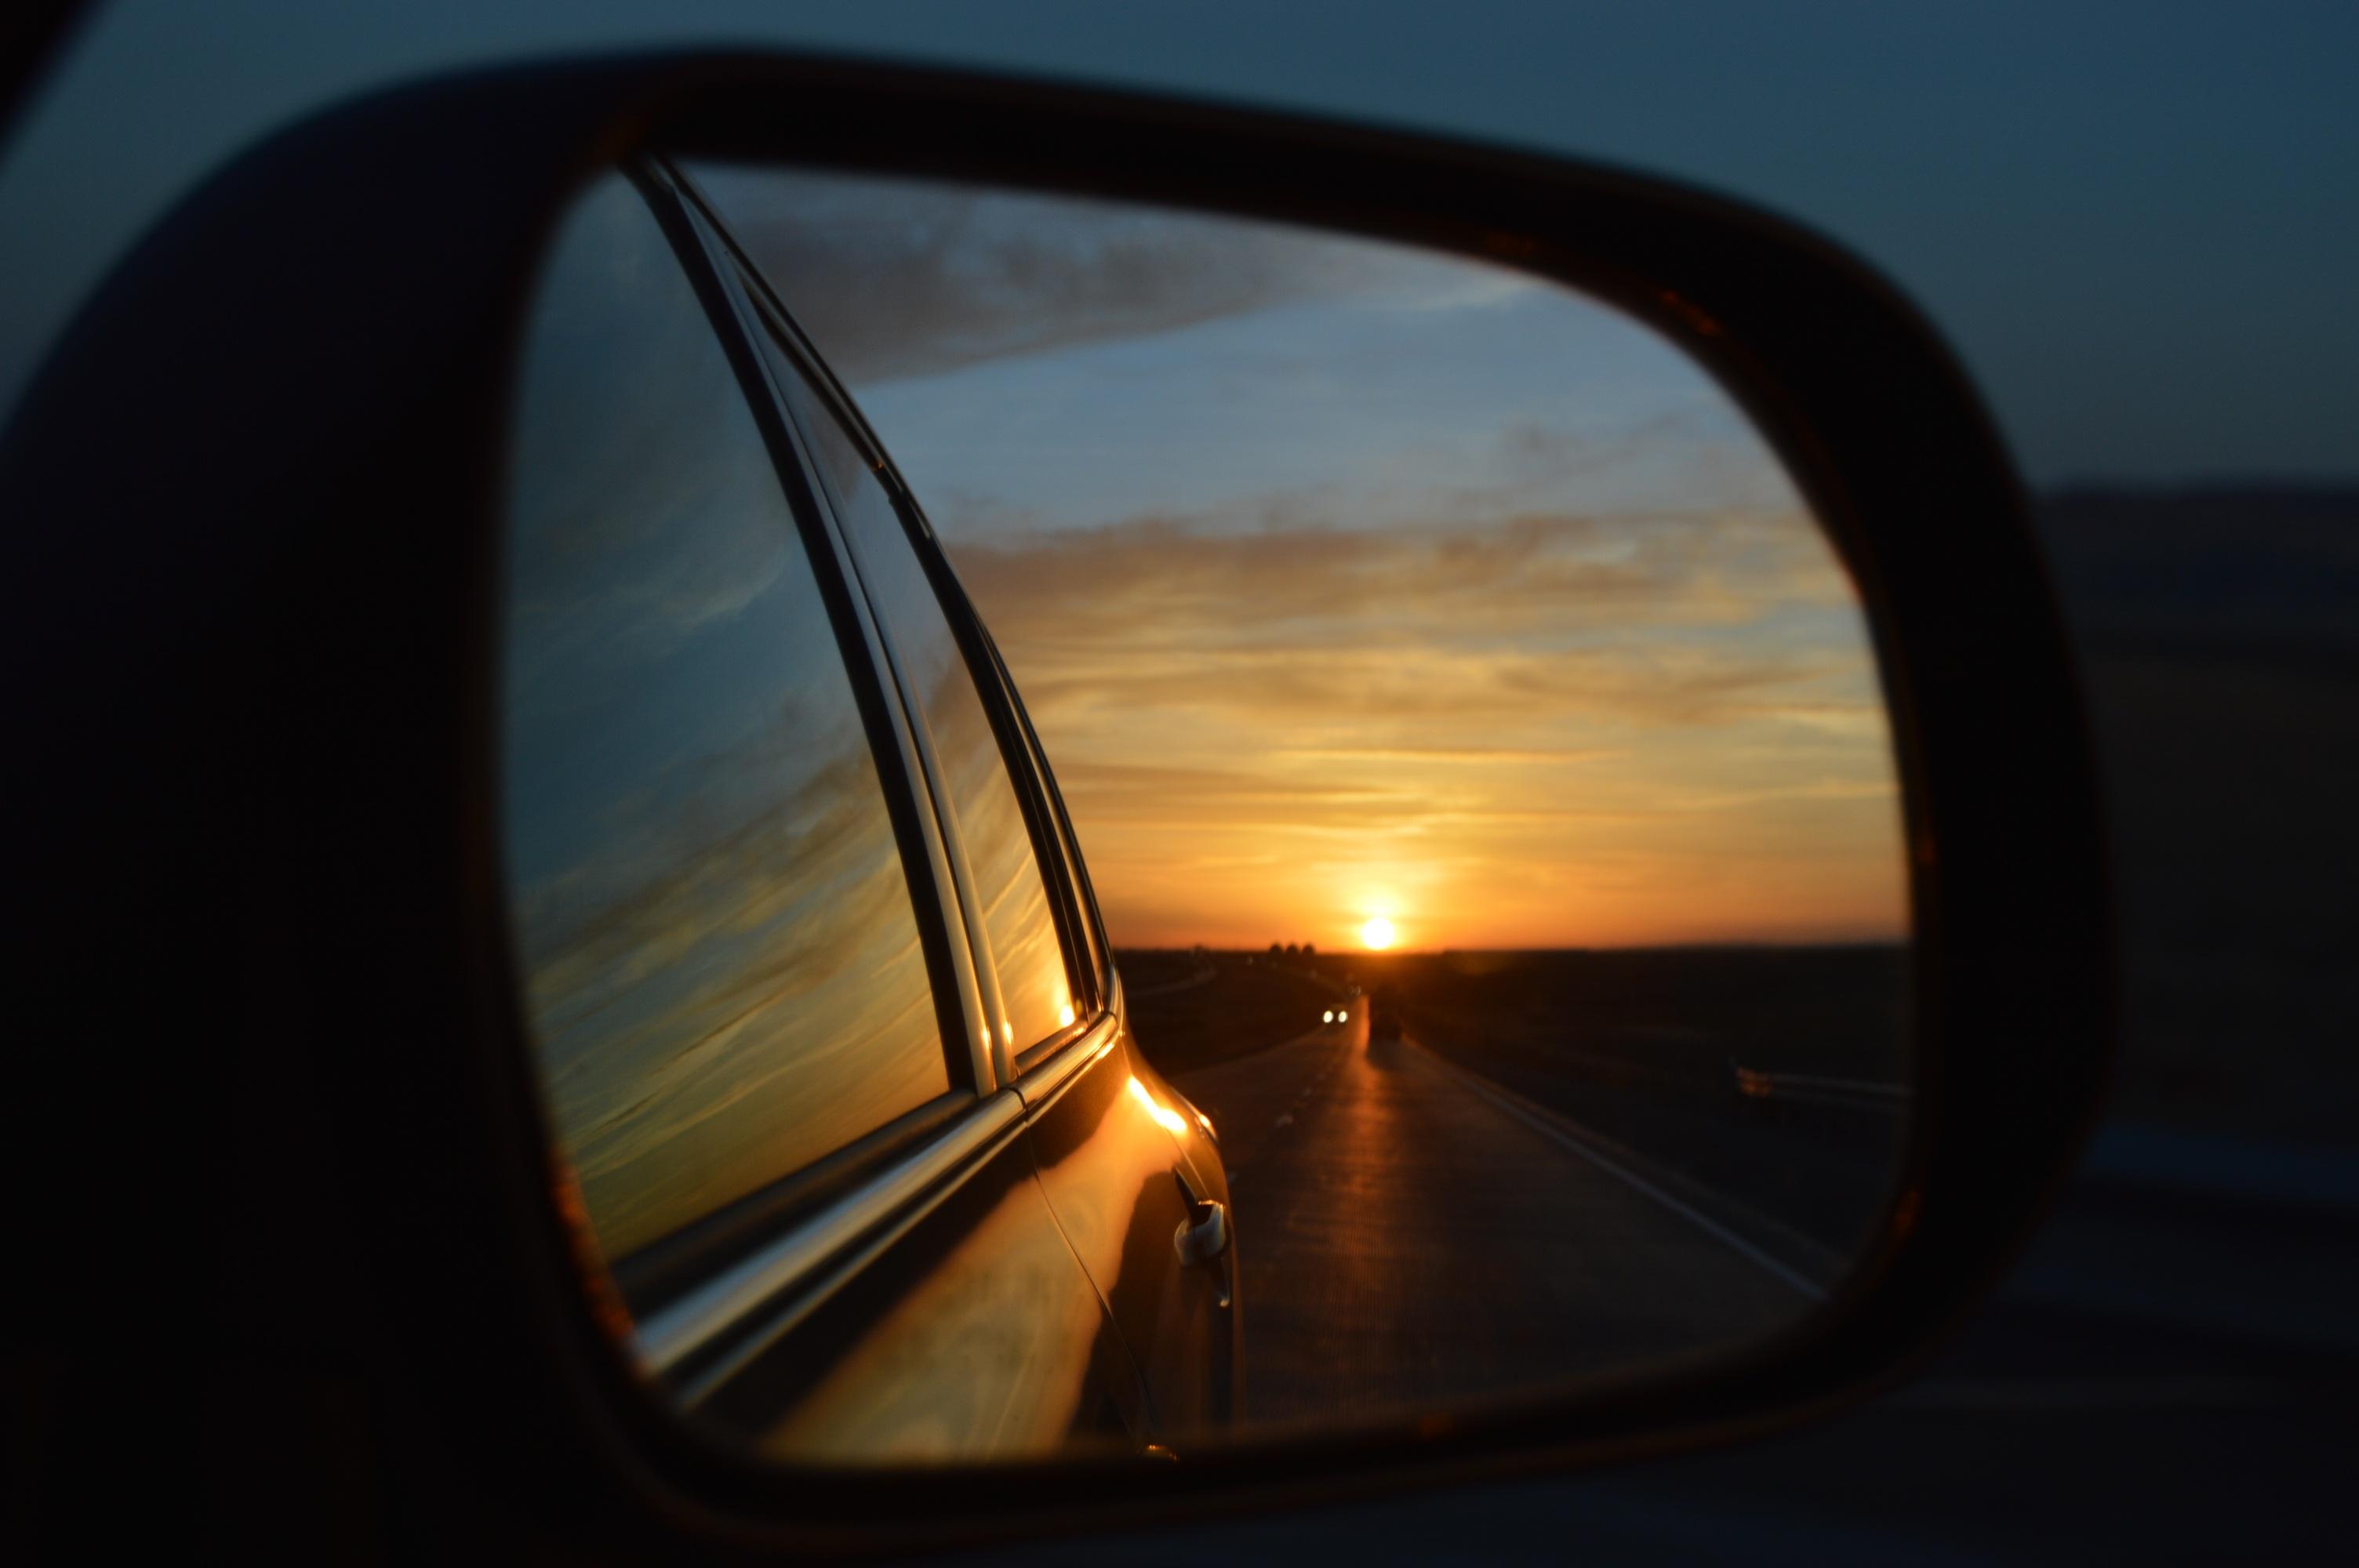 Free Images : light, sky, sun, sunrise, sunset, car ...